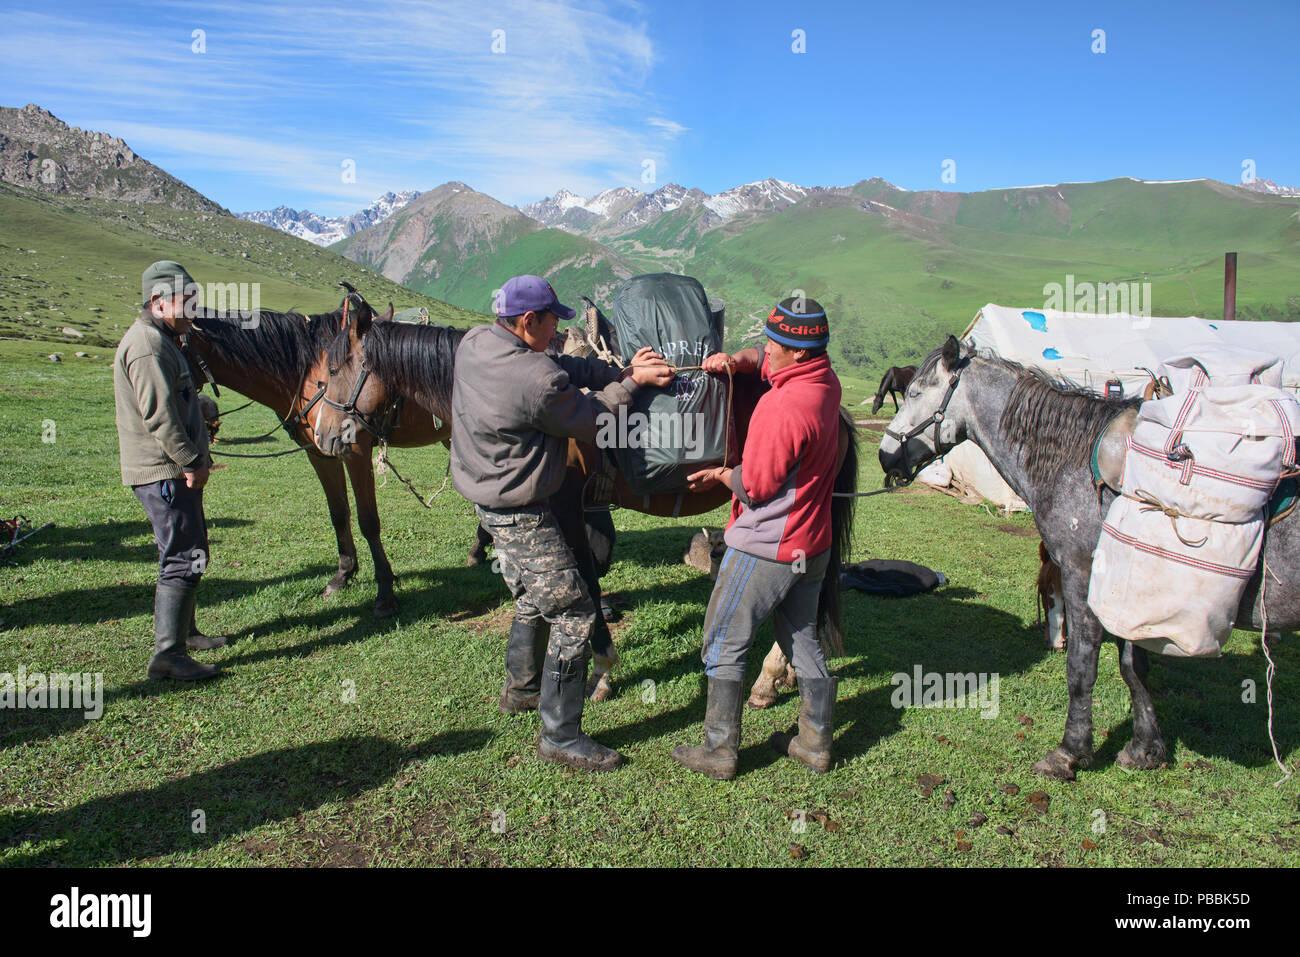 Horse trekking the alpine Keskenkija Trek, Jyrgalan, Kyrgyzstan - Stock Image